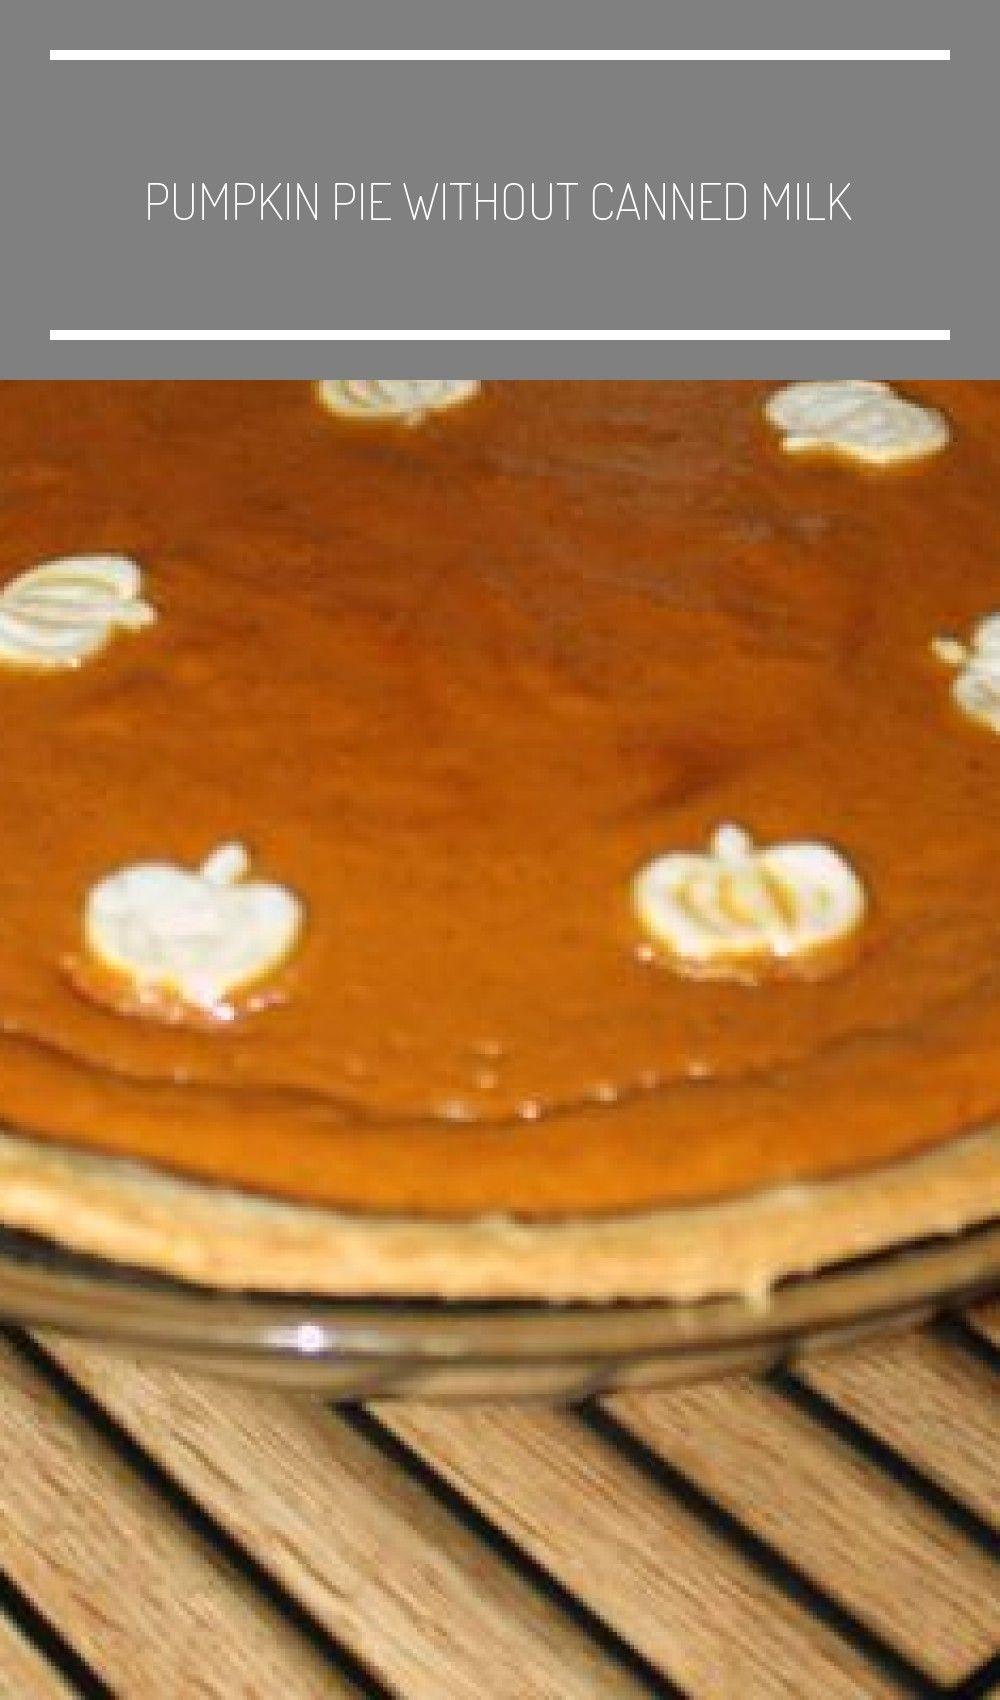 Pumpkin Pie Recipe No Canned Milk One Mama S Daily Drama This Recipe Is So Good It S Made With Regular Milk Inste Pumpkin Pie Recipes Healthy Pumpkin Pies Pie Recipes